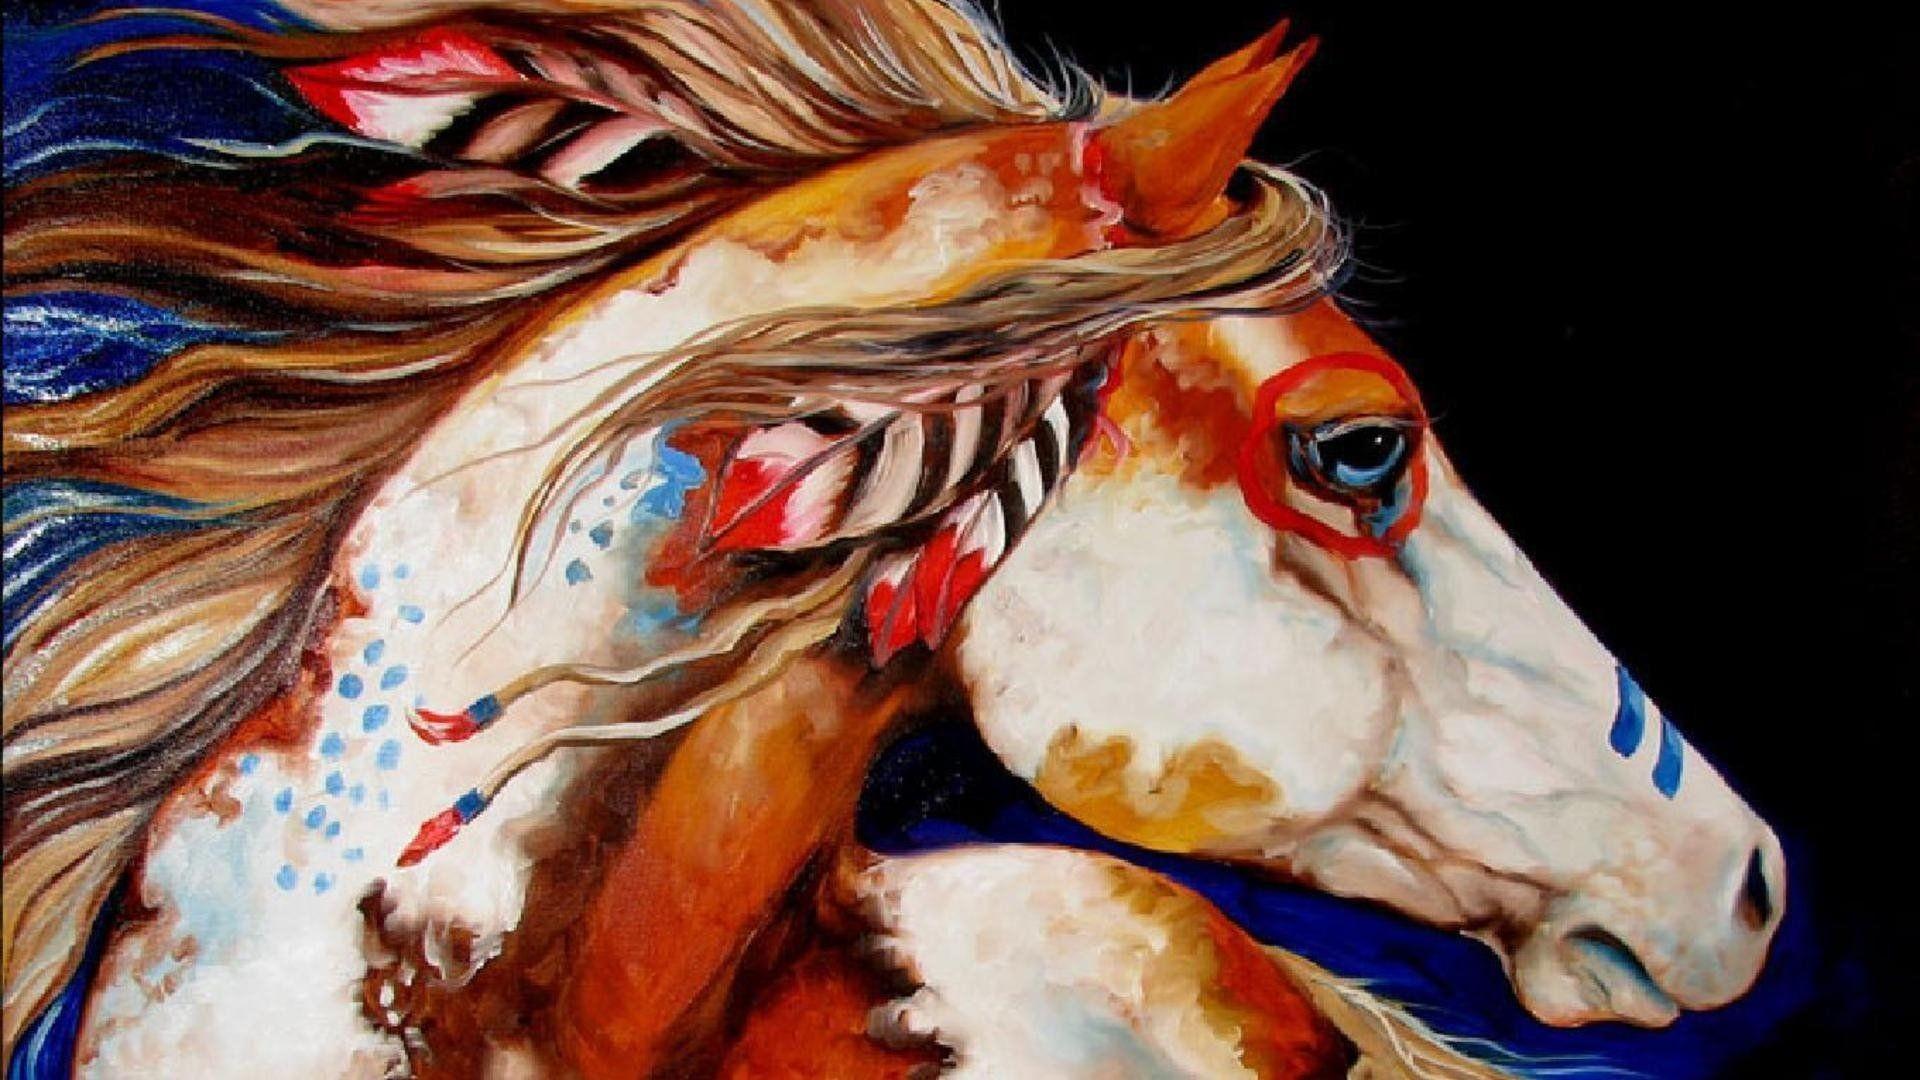 Native American Screensavers and Wallpaper 64+ images